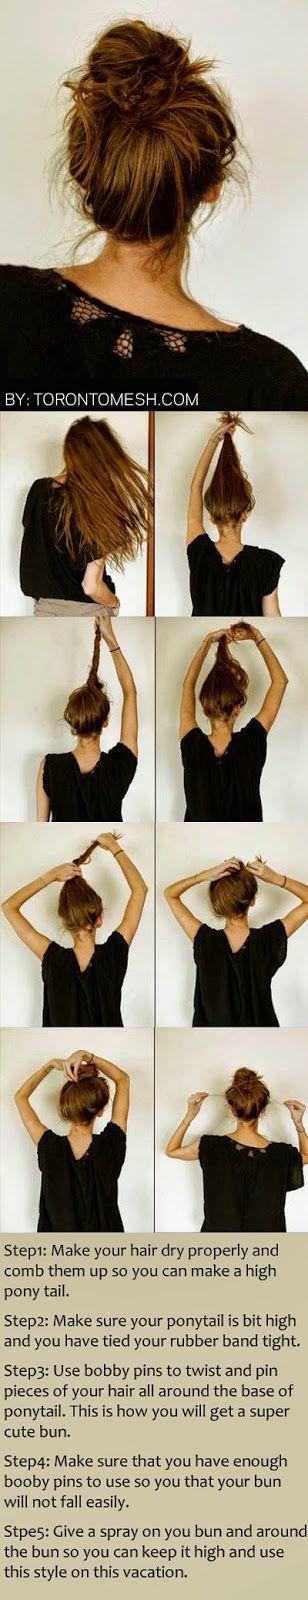 Astounding 1000 Ideas About Long Hair Buns On Pinterest Long Braids Low Short Hairstyles For Black Women Fulllsitofus